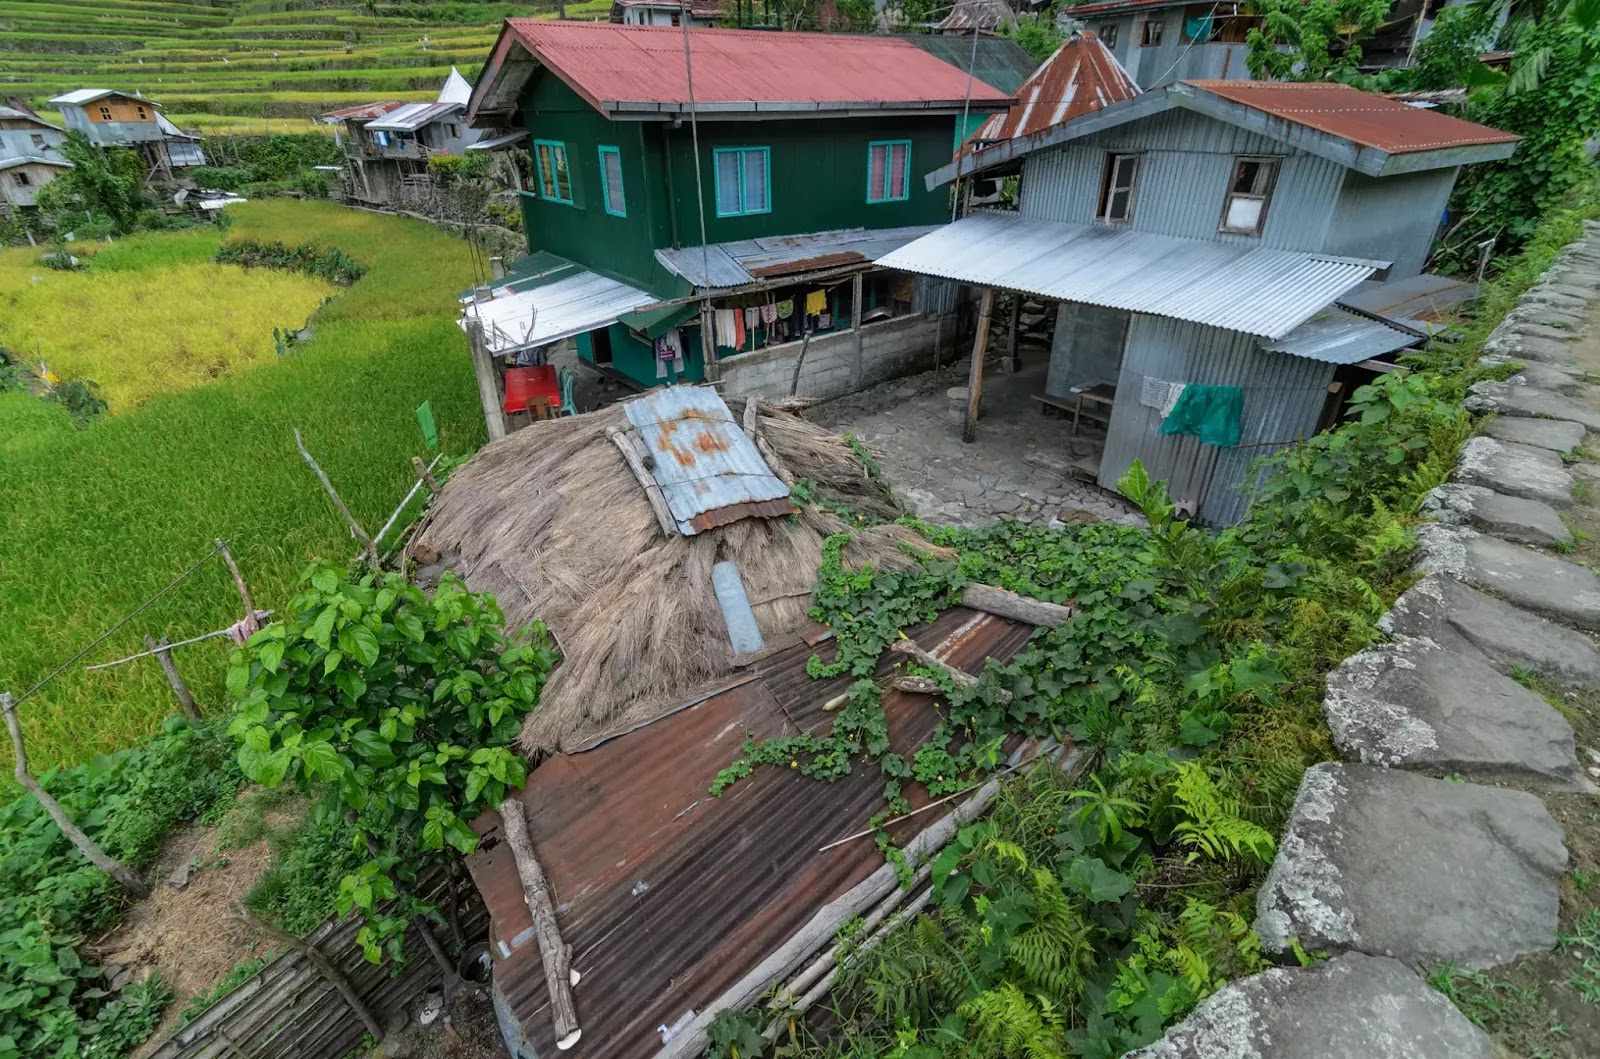 Batad Community Cluster Ifugao Cordillera Administrative Region Philippines